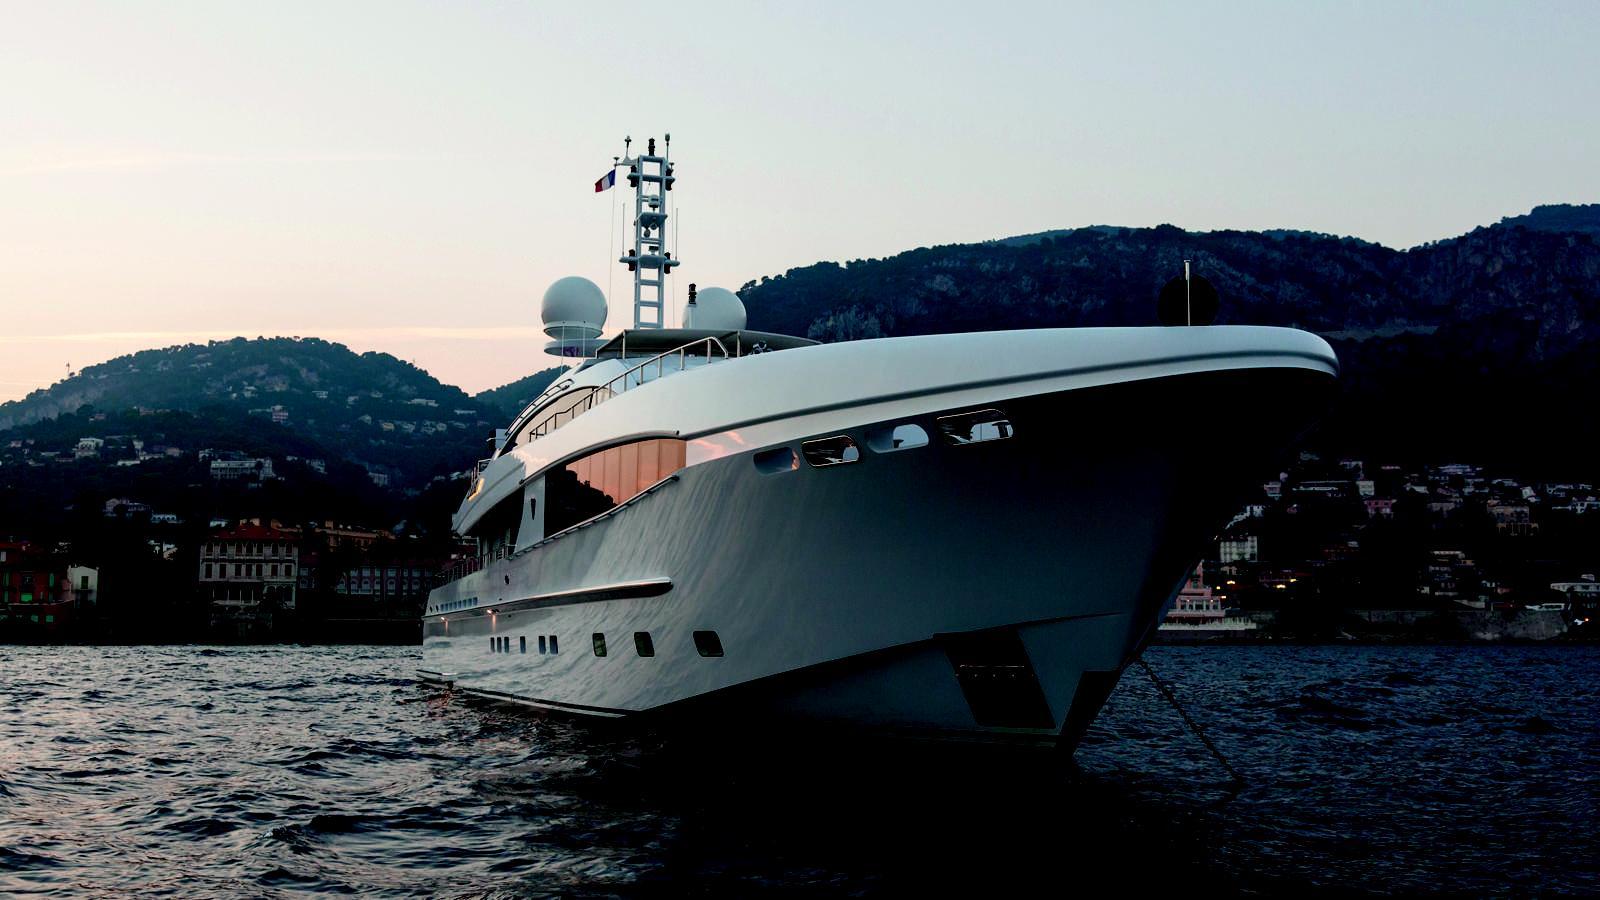 taurica-motor-yacht-heesen-2014-40m-bow